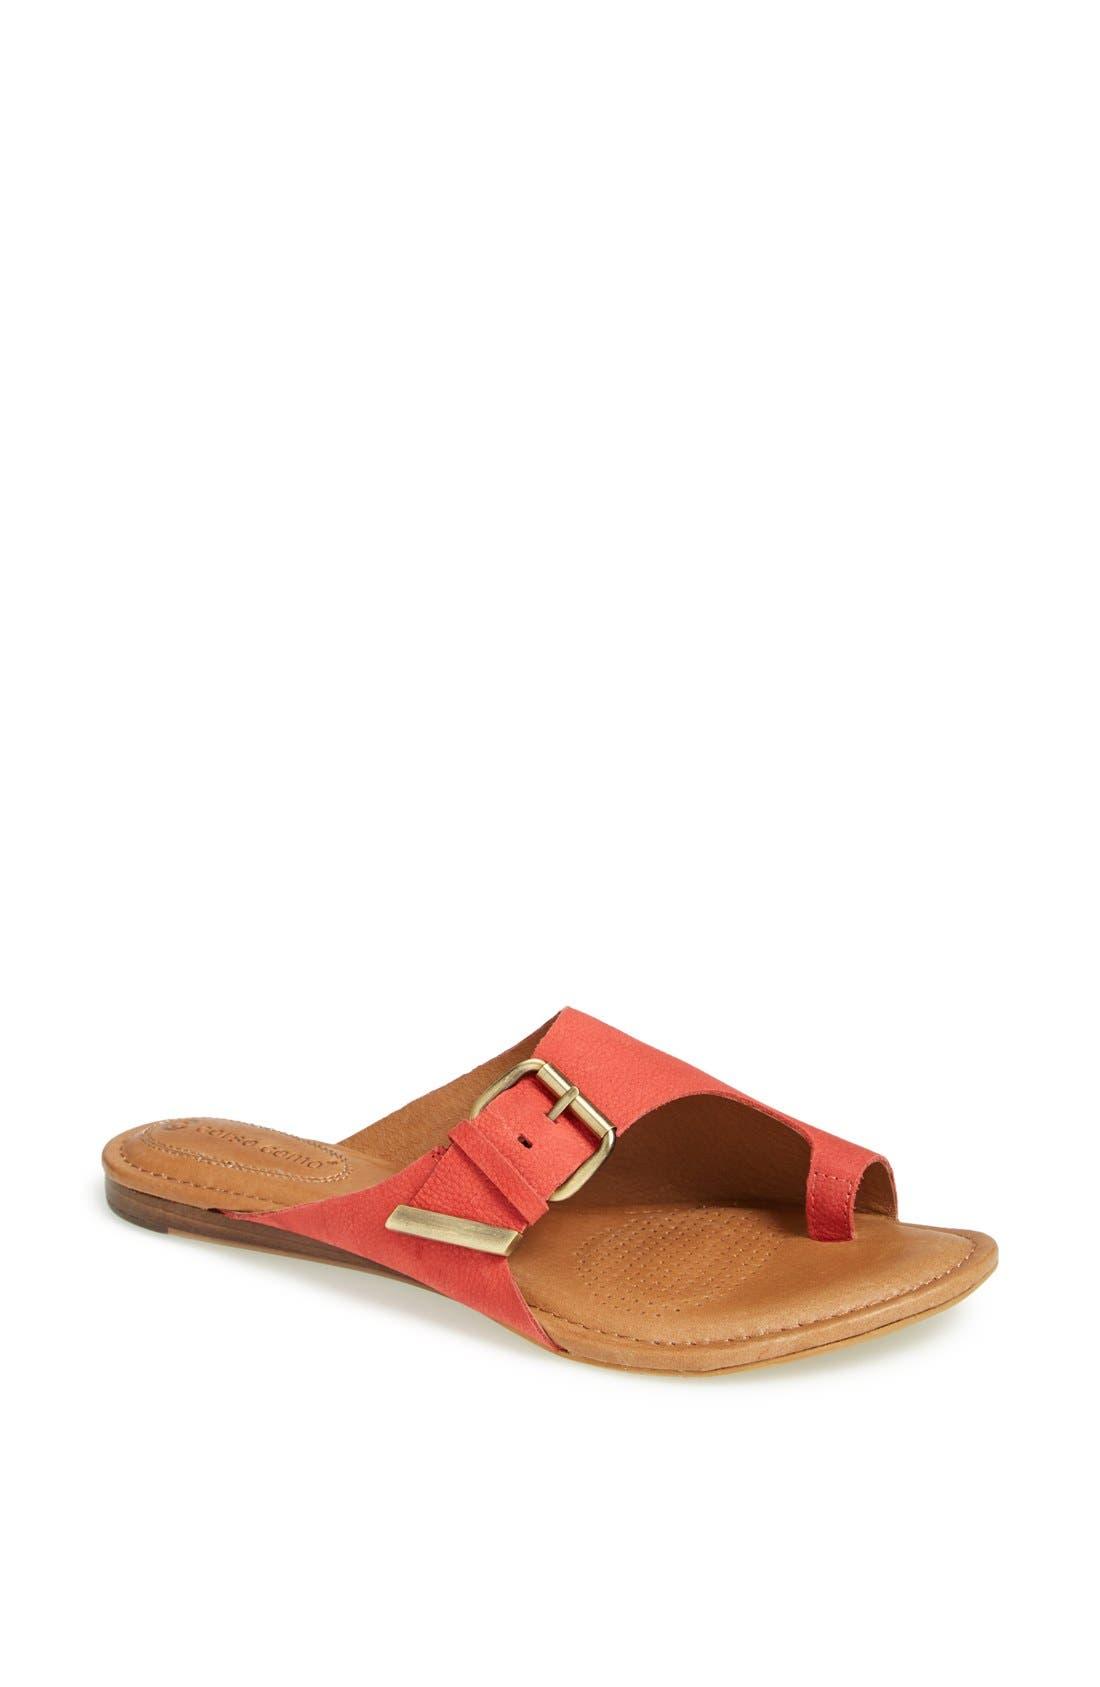 Alternate Image 1 Selected - Corso Como 'Slim' Sandal